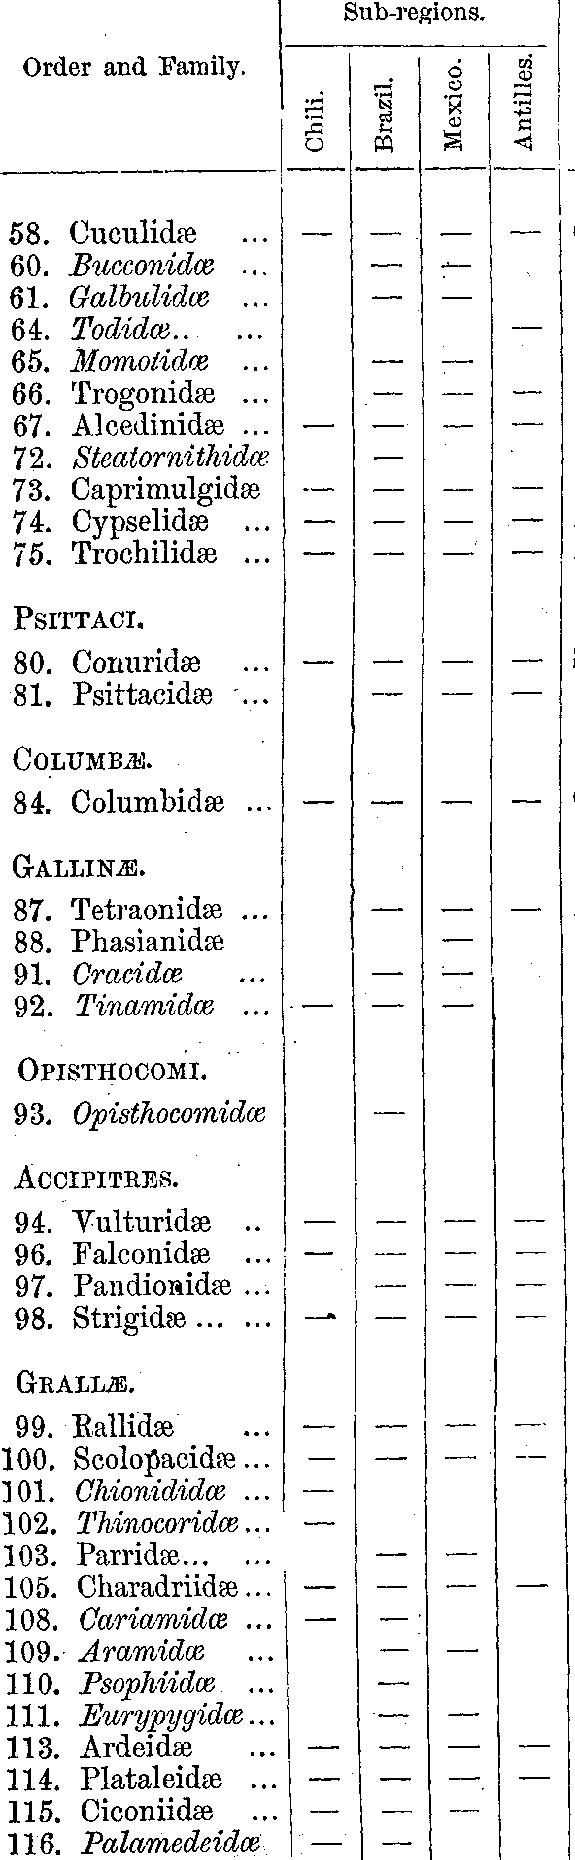 [merged small][ocr errors][merged small][merged small][merged small][merged small][merged small][merged small][merged small][merged small][merged small][merged small][merged small][merged small][merged small][merged small][merged small]